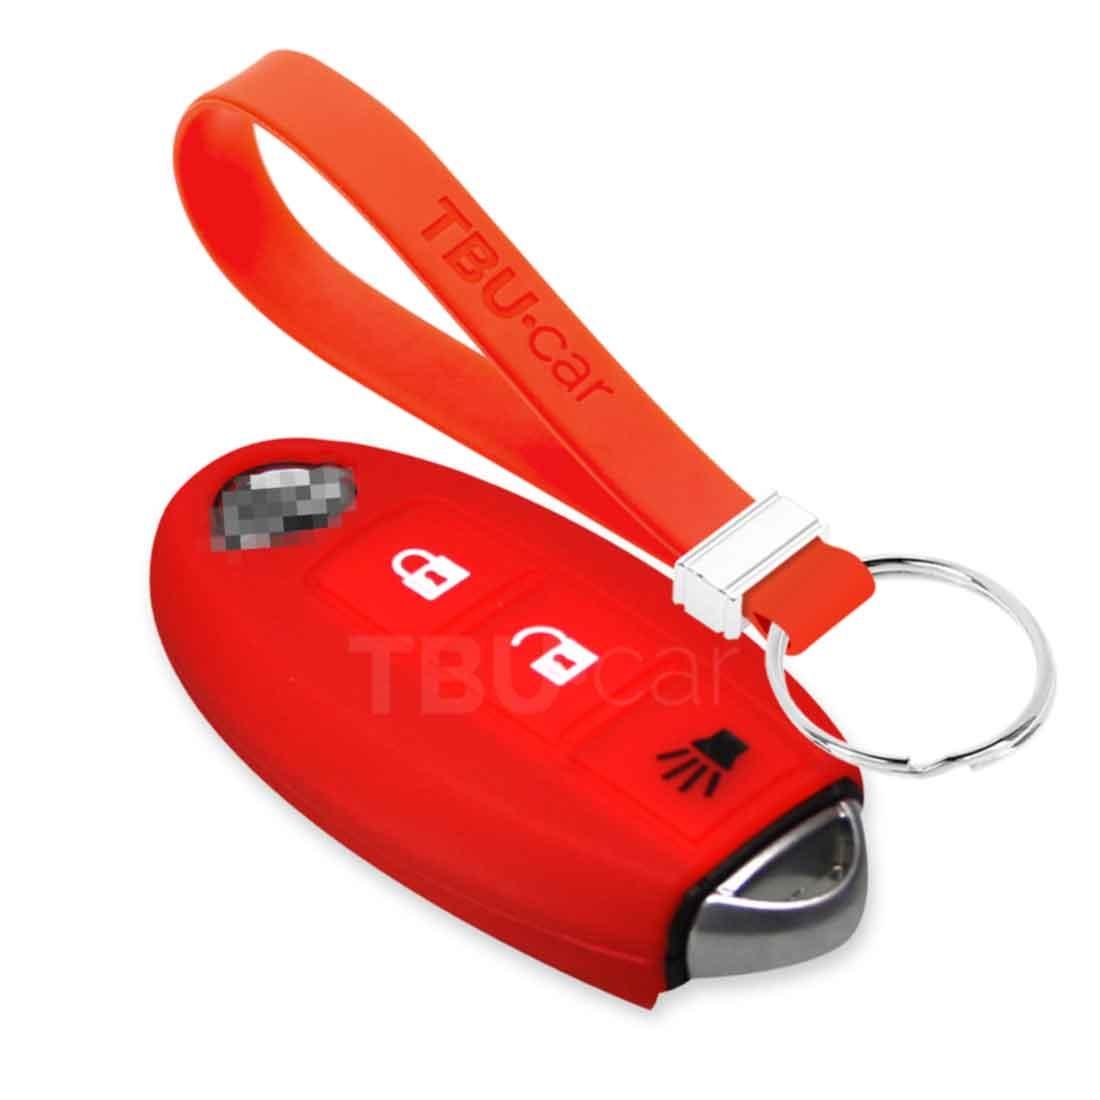 TBU car TBU car Sleutel cover compatibel met Nissan - Silicone sleutelhoesje - beschermhoesje autosleutel - Rood